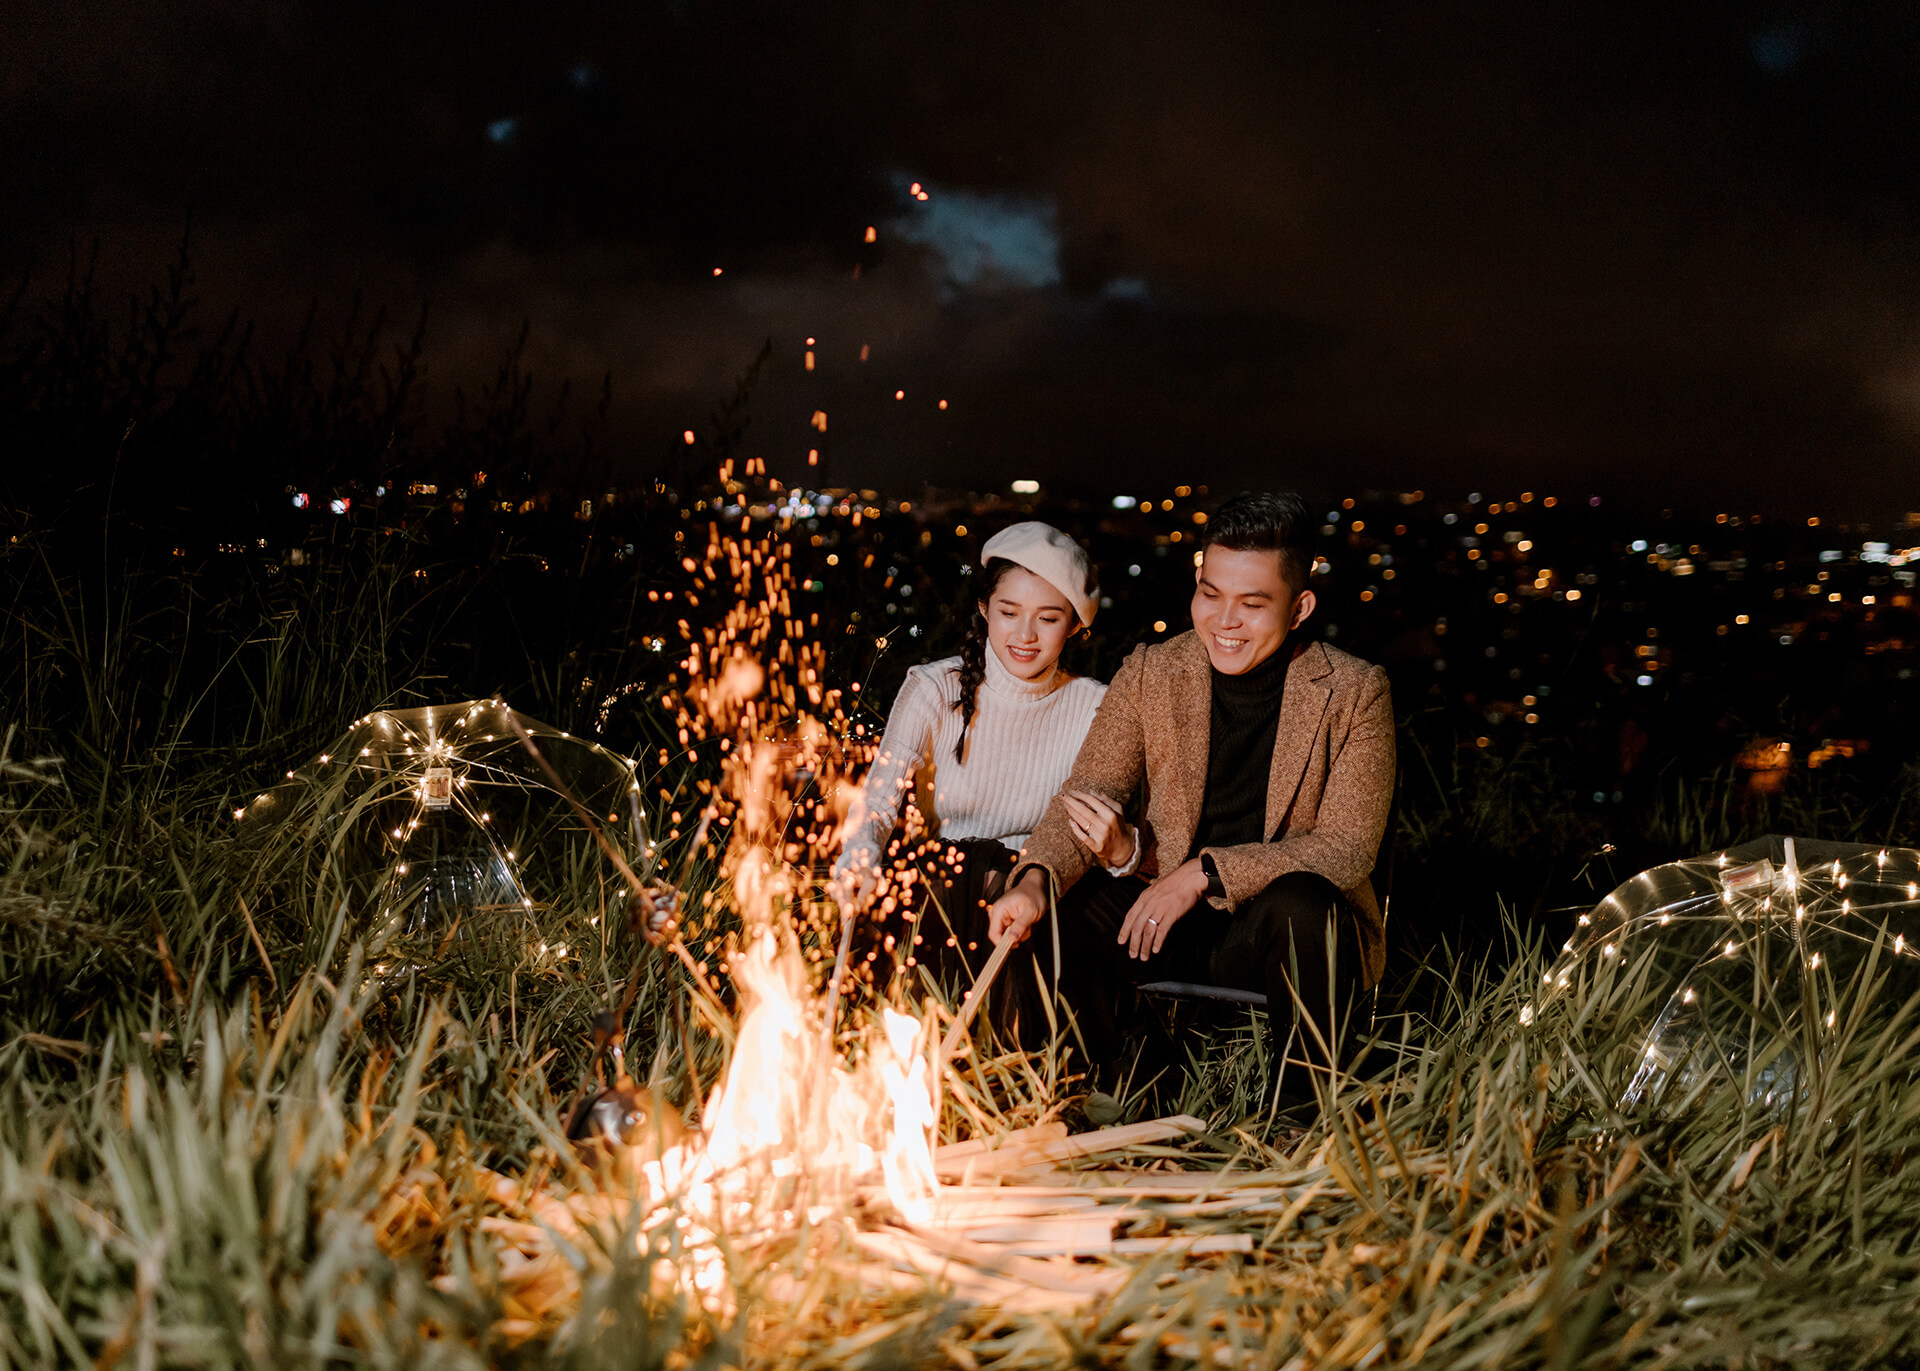 romantic hobbies for couples